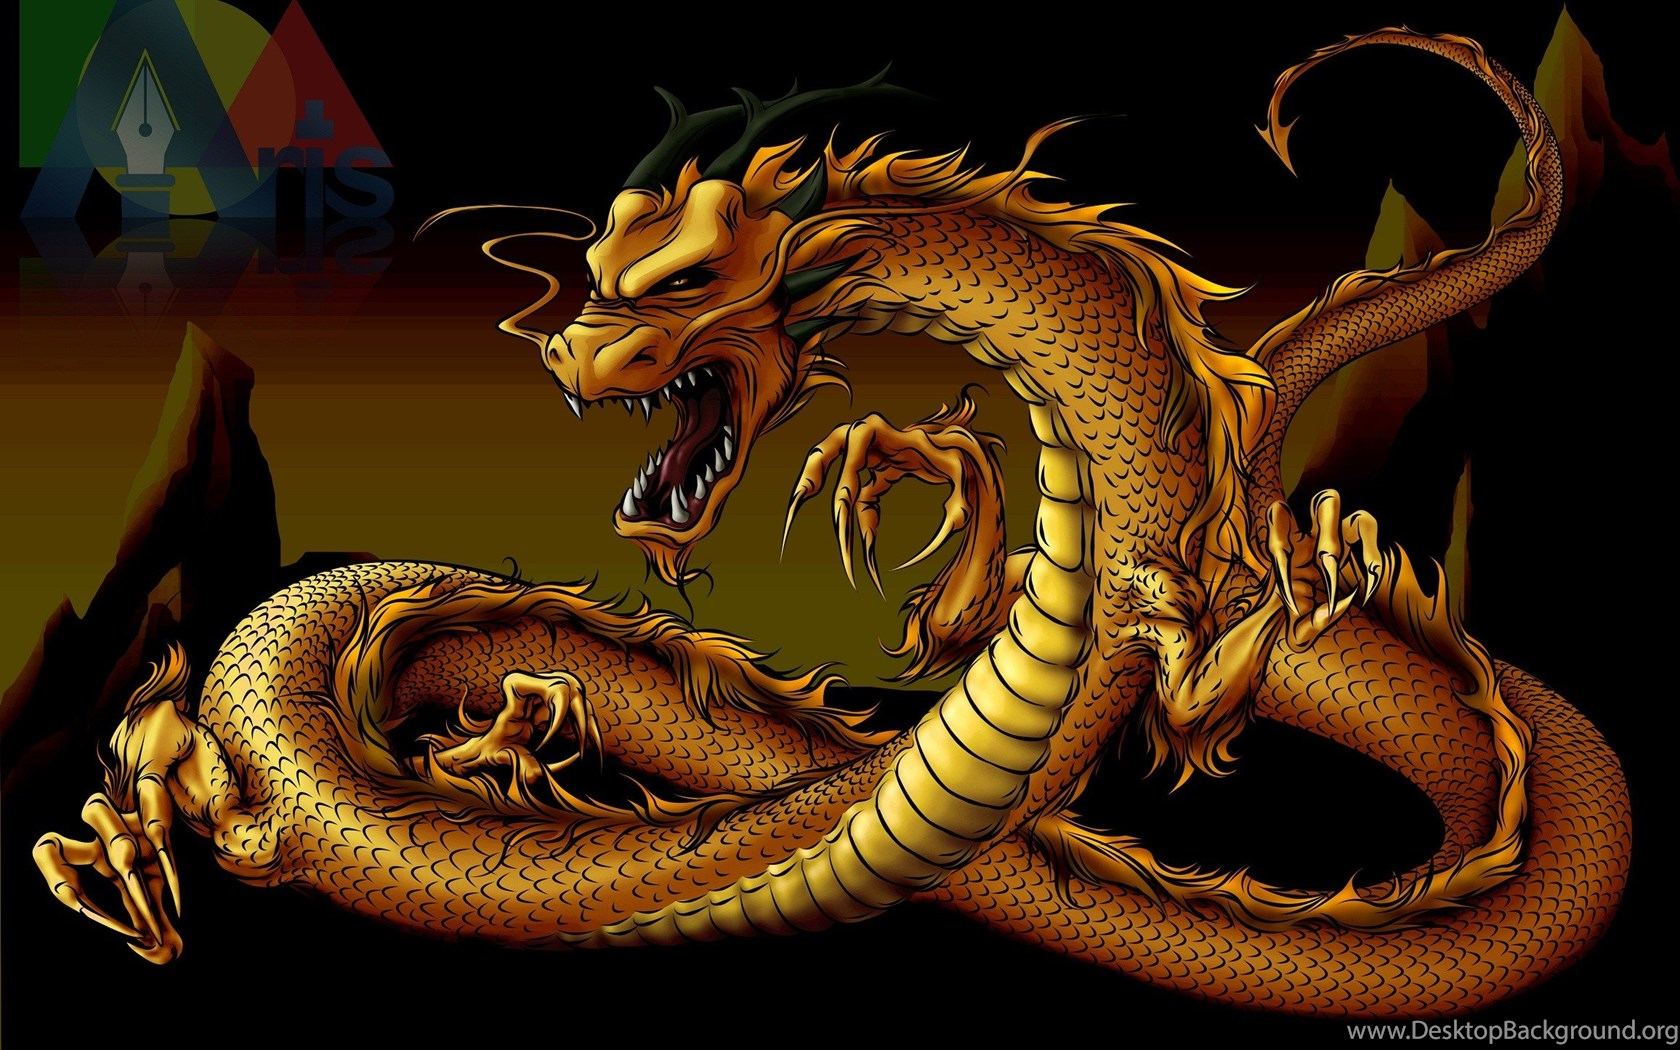 Gold Dragon 16 Wide Wallpapers Hivewallpaper Com Desktop